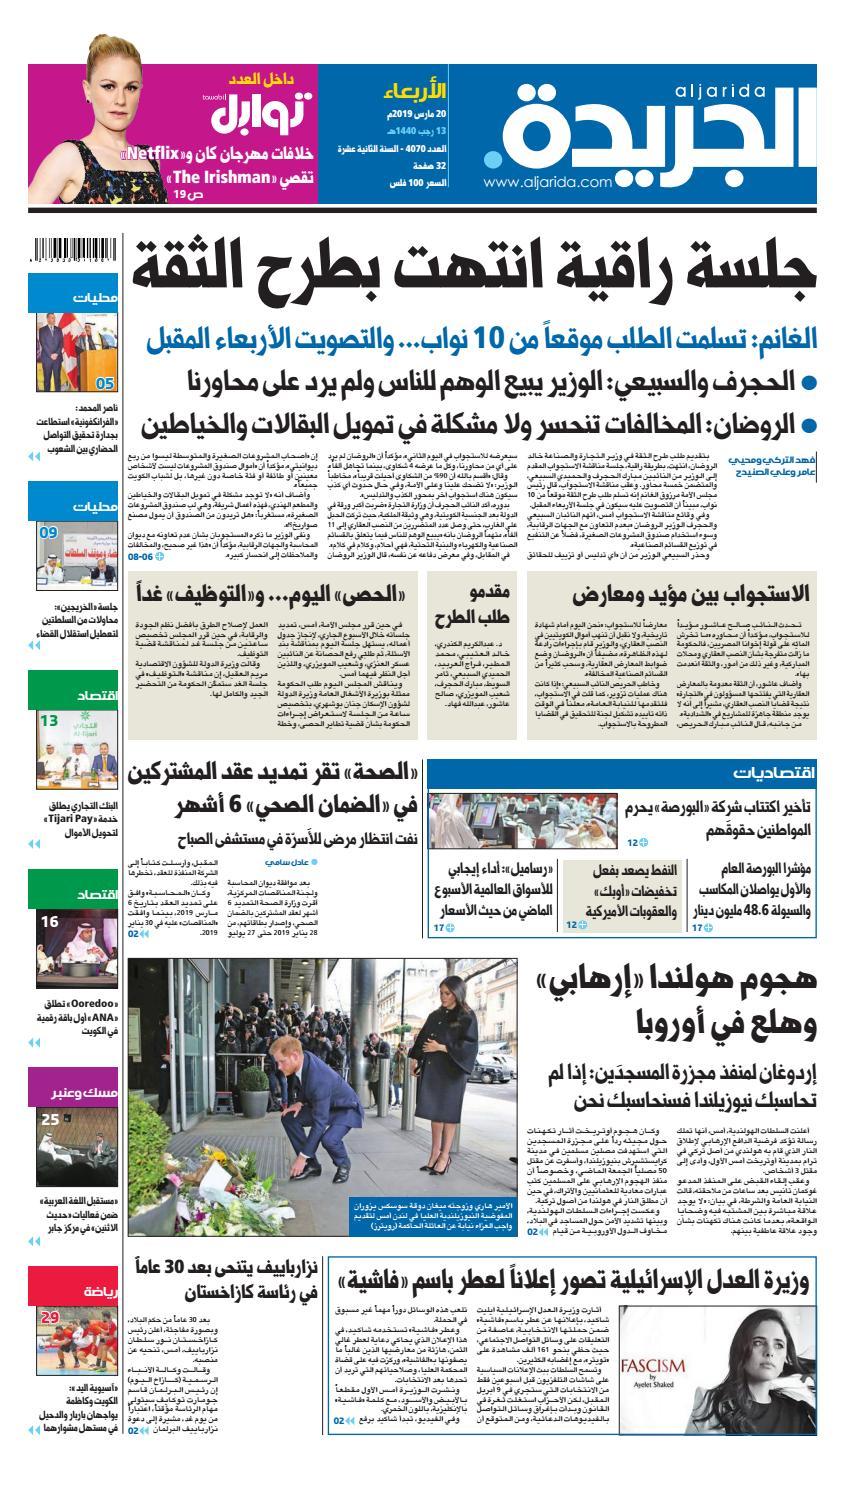 fcea730b746f3 عدد الجريدة الاربعاء 20 مارس 2019 by Aljarida Newspaper - issuu